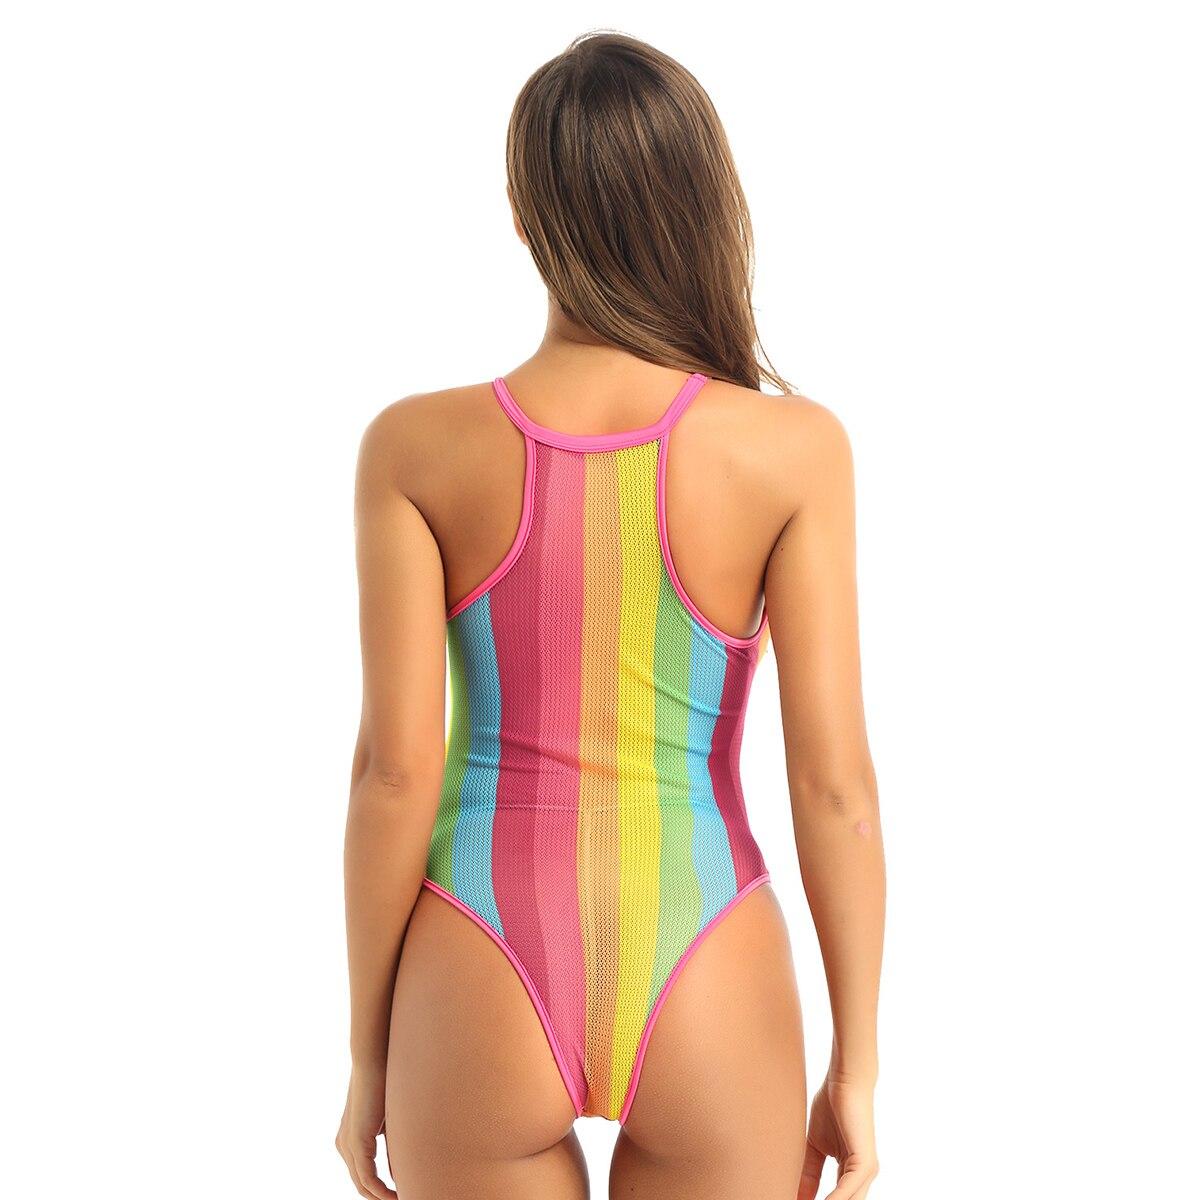 Lingerie Exotic Dancer Stripper Striped Monokini  teddie romper 4 color choices